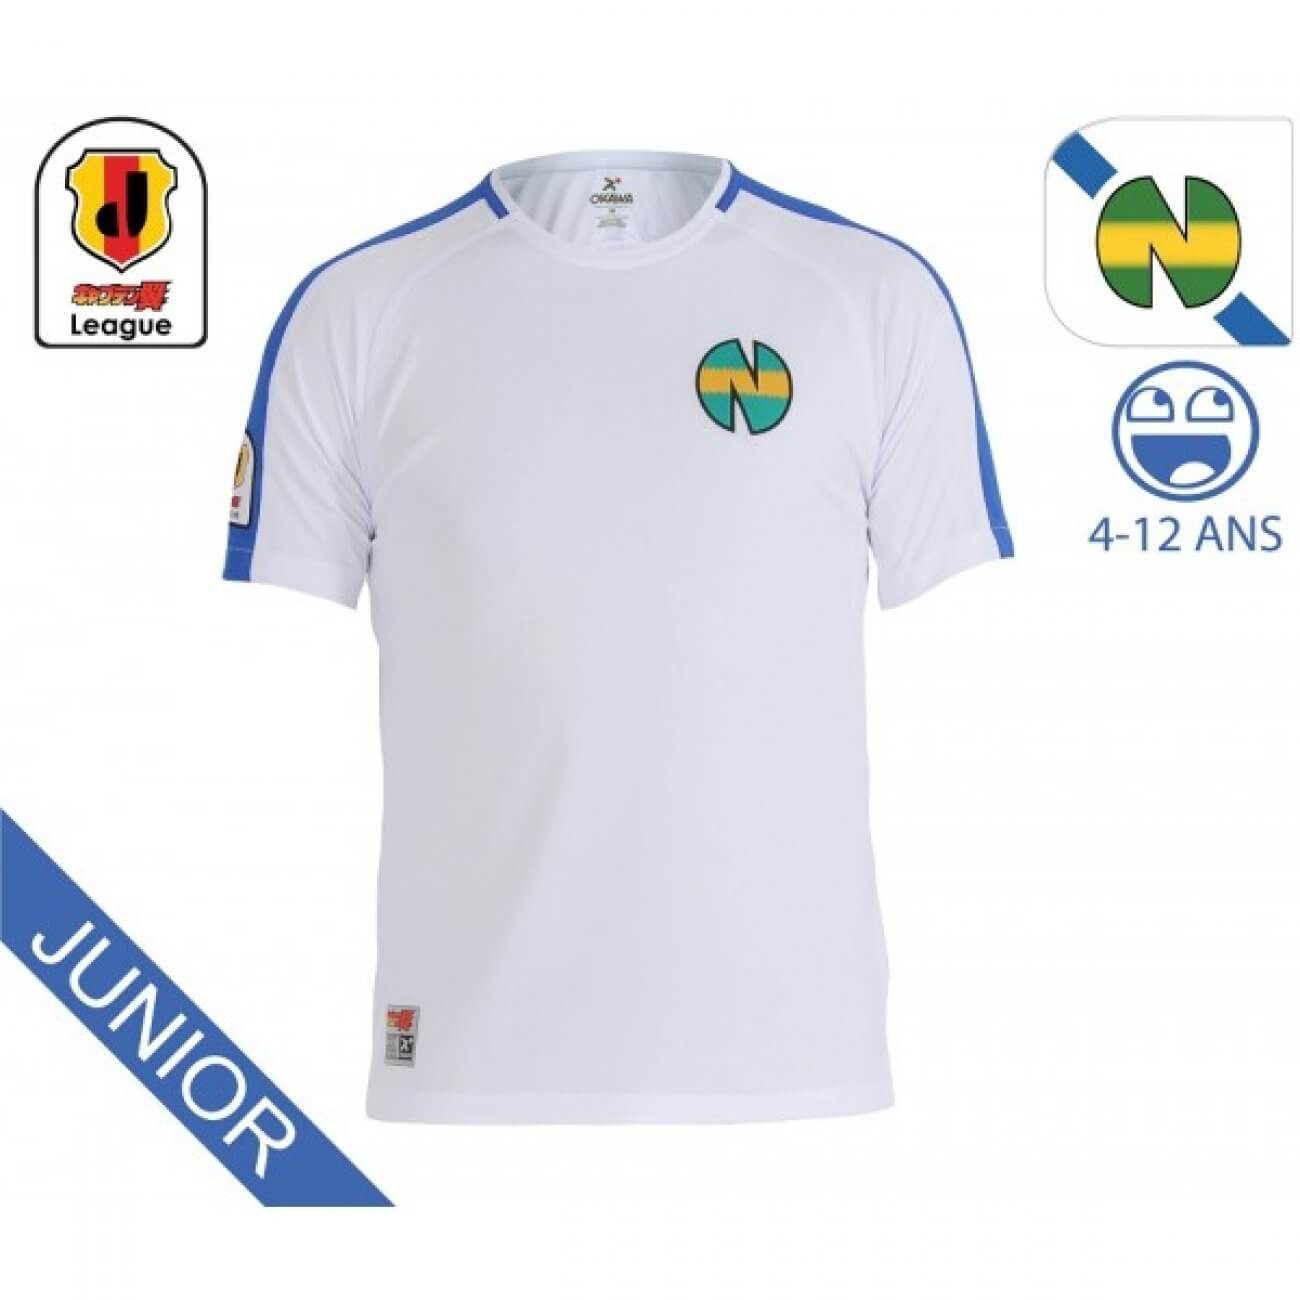 New Team 1º season sport shirt